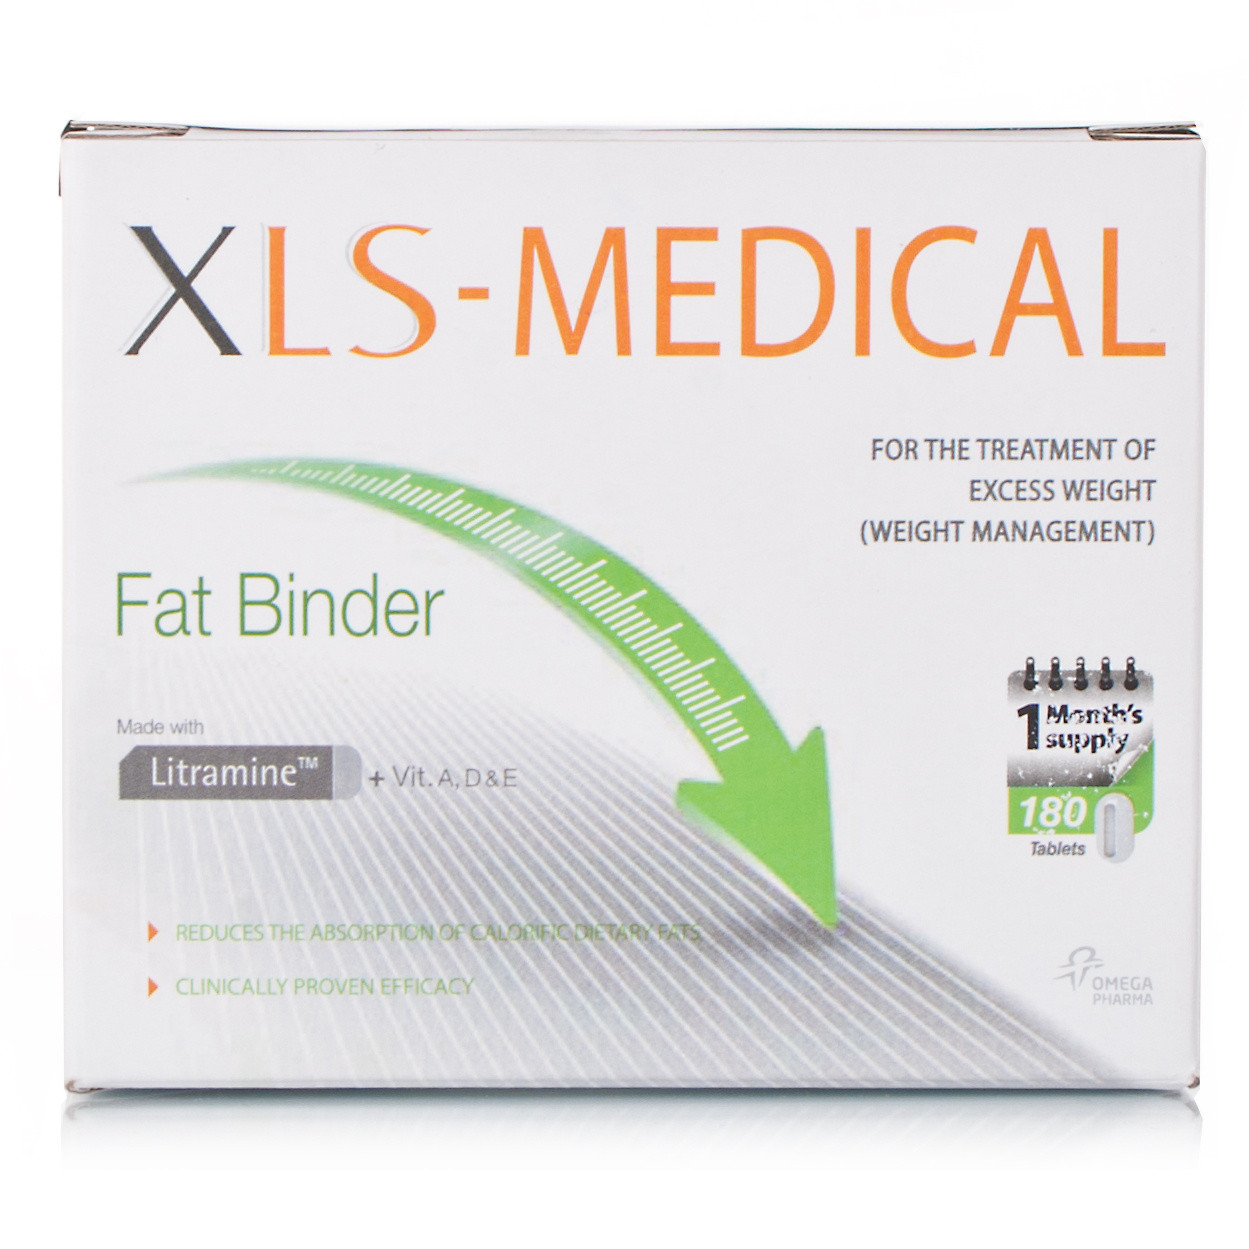 XLS-Medical Fat Binder 180 Tablets